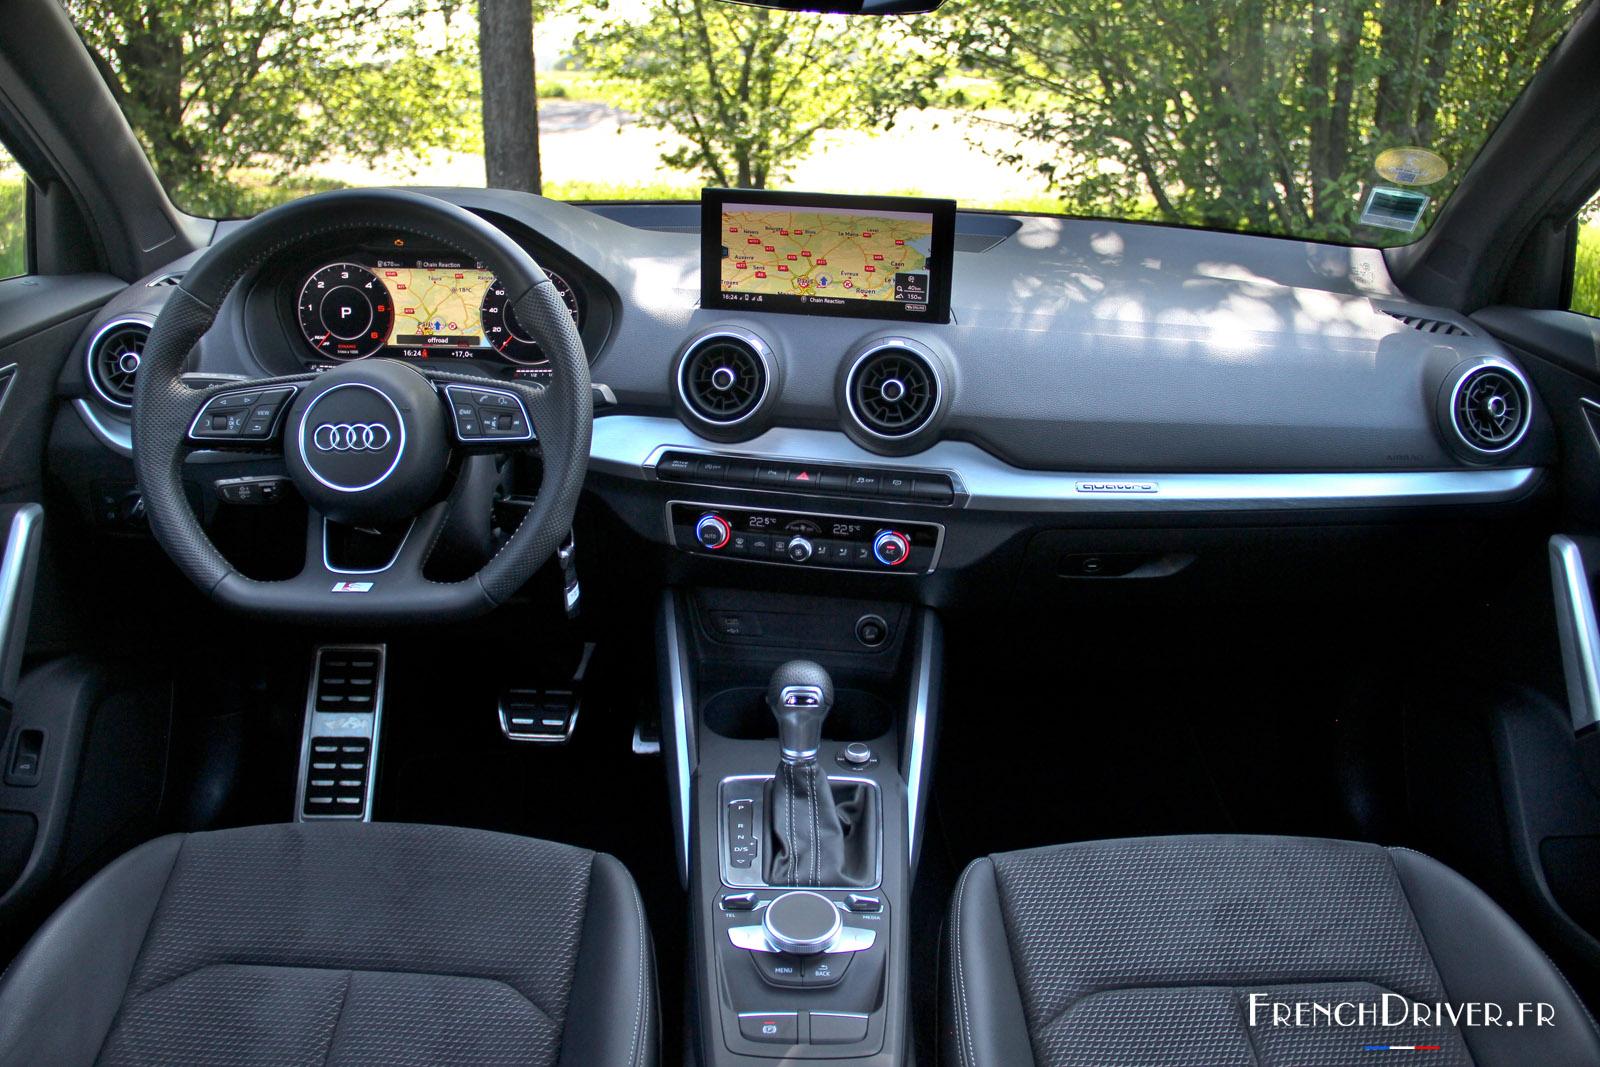 Essai Audi Q2 Tdi 190 S Line Citadine Pour Parisienne Pressee French Driver